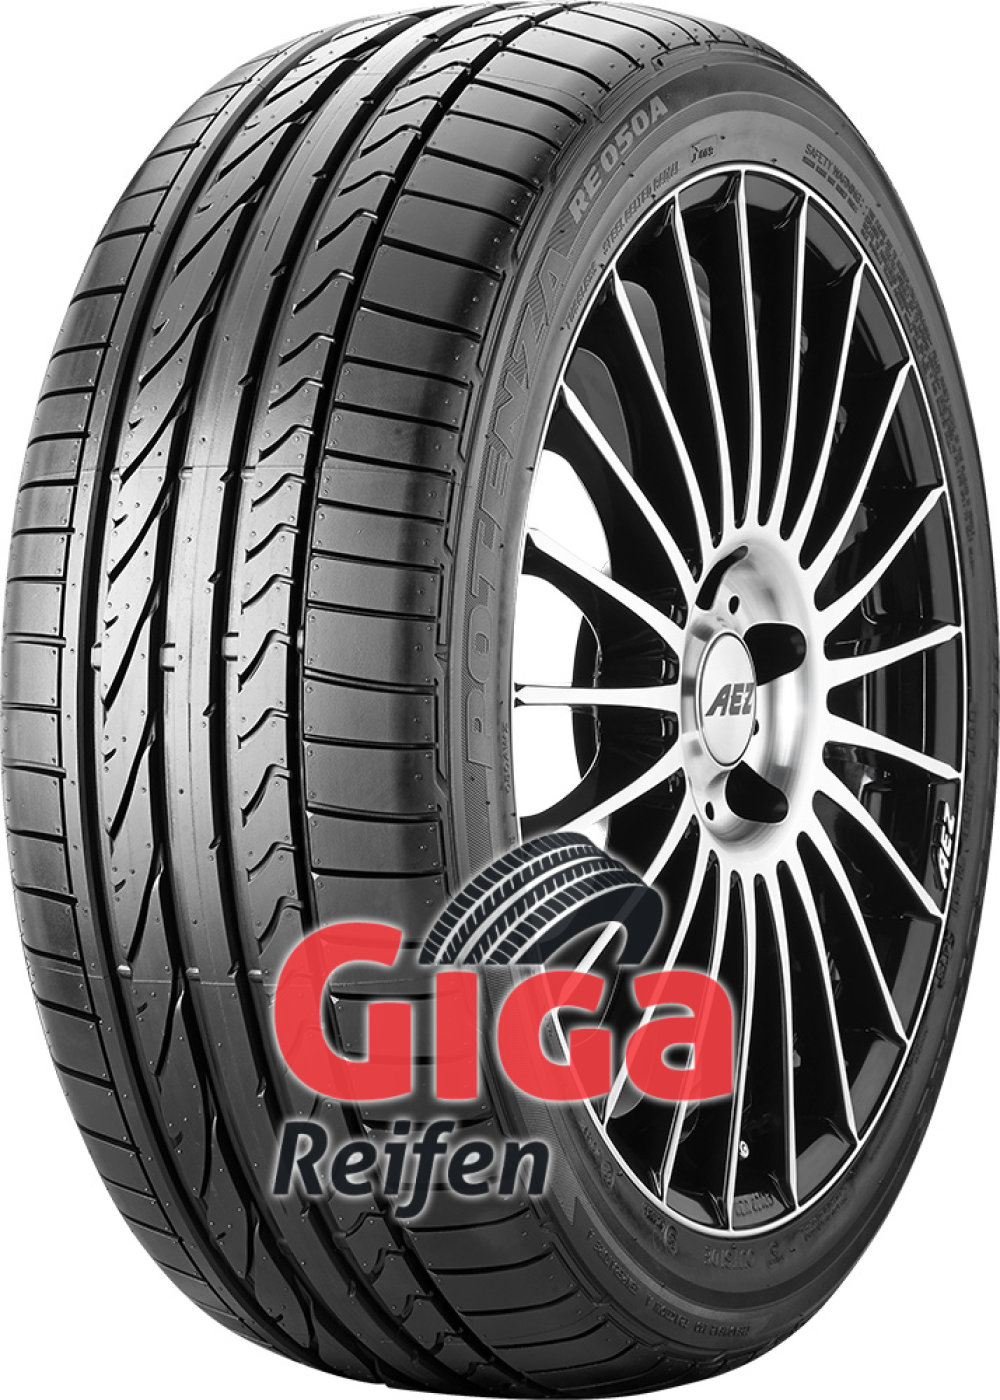 Bridgestone Potenza RE 050 A ( 205/45 R17 88V XL mit Felgenschutz (MFS) )